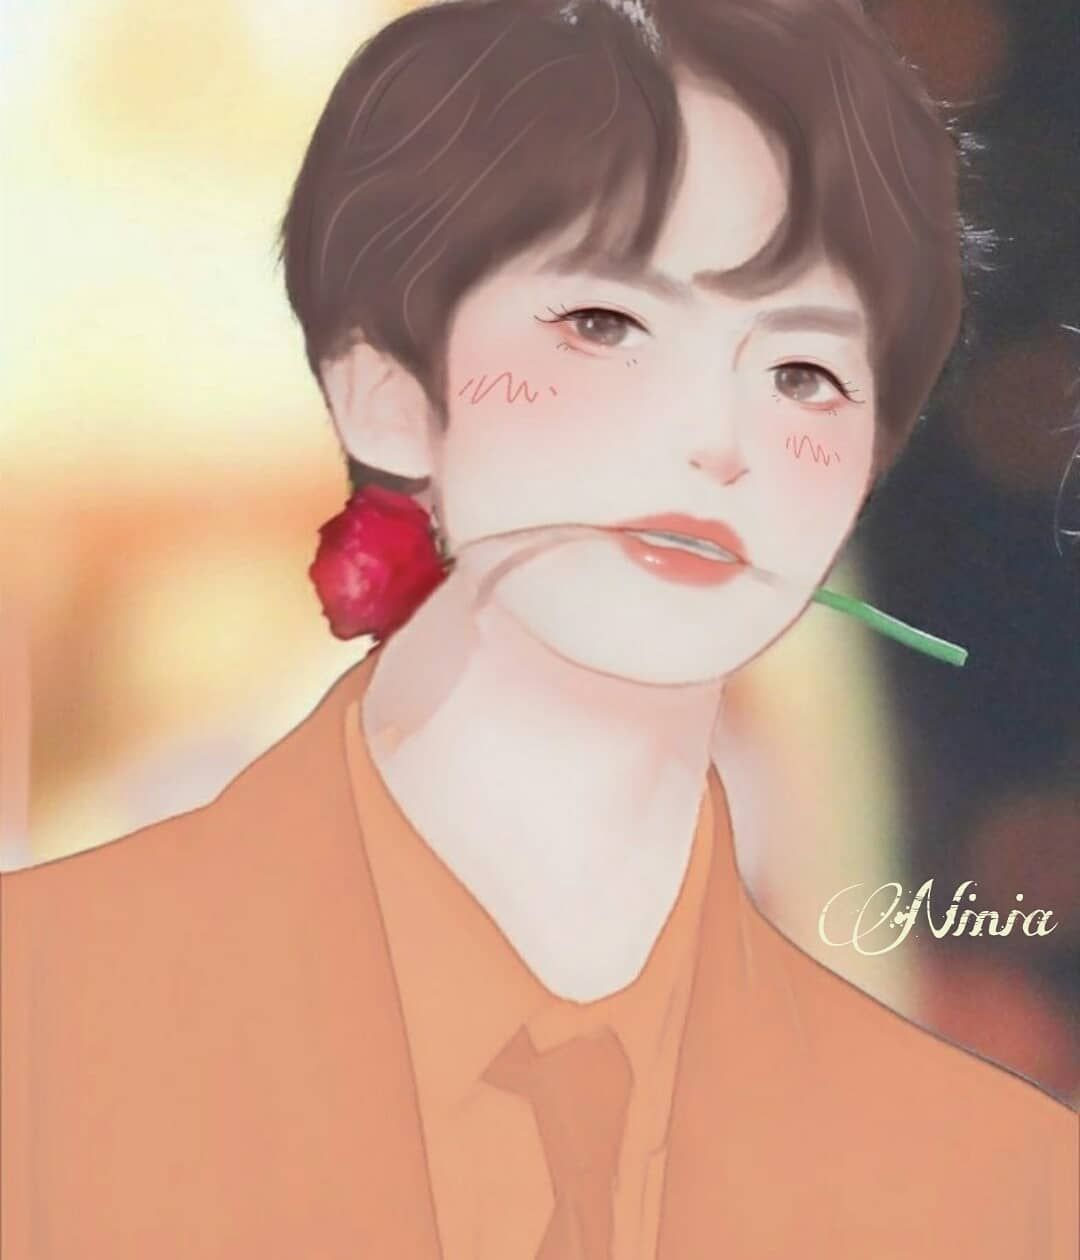 Plz visit my YouTube channel for more bts videos link in my bio Kim seok jin Plz don't repost without permission . . . #kimseokjin #kimseokjinedit #jinedit #jinfanart #jinbts #bts #btsfanart…